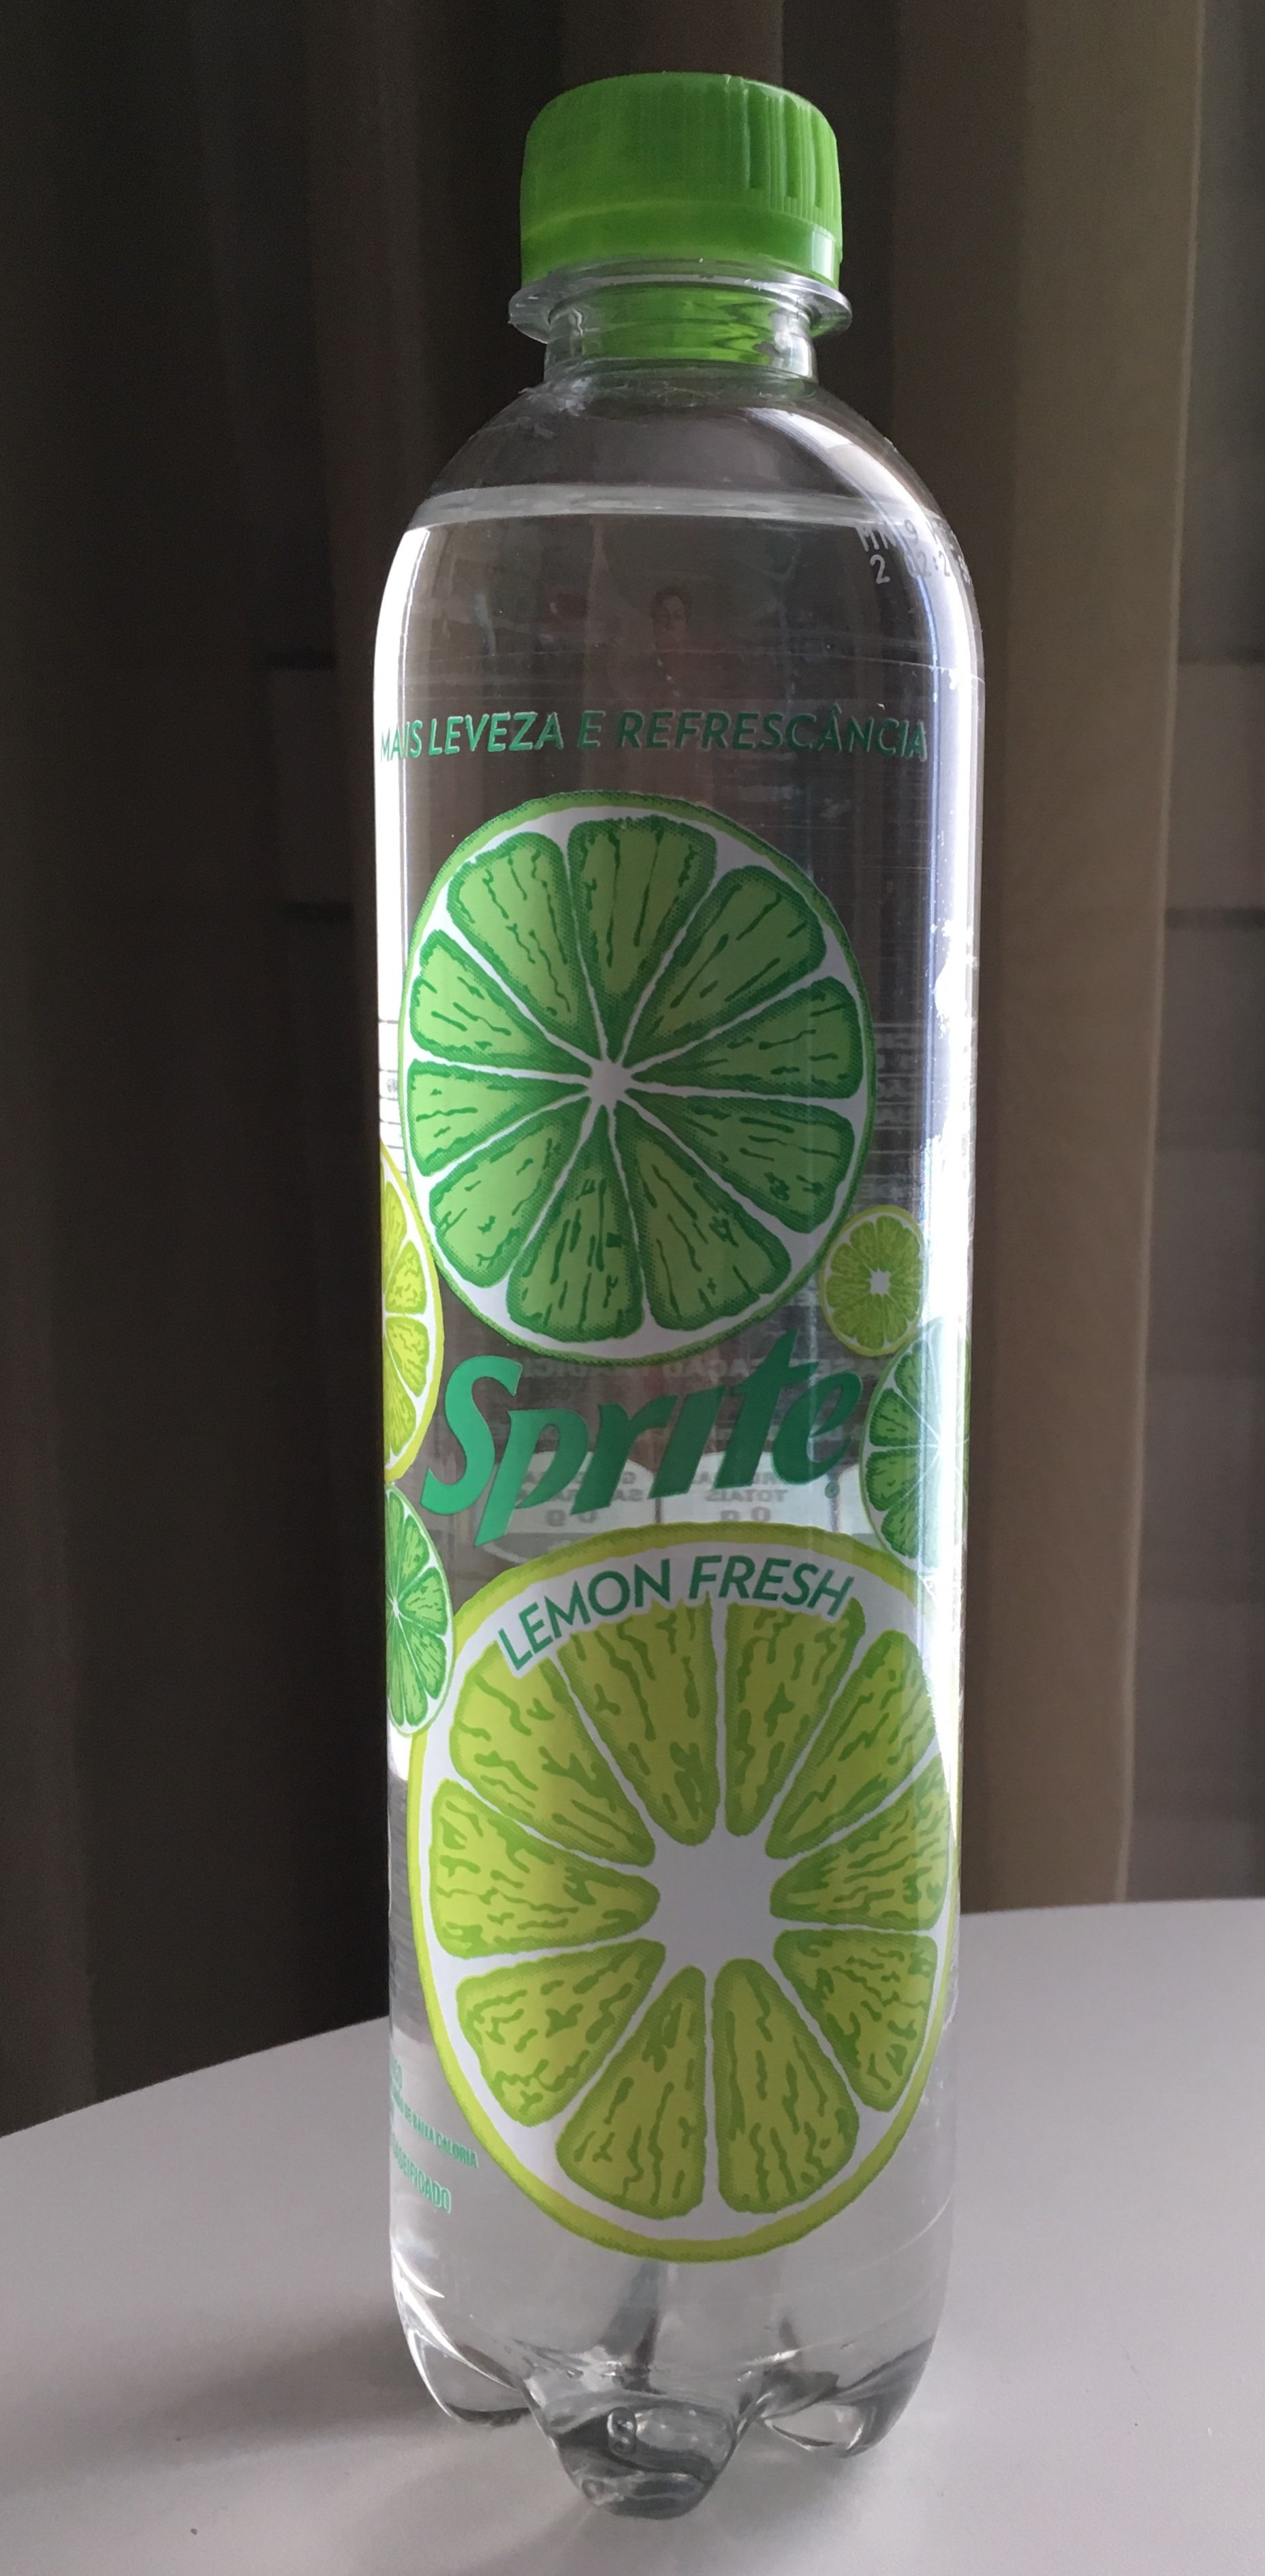 Sprite Lemon Fresh zero in a plastic bottle - Brazil 2019 | Soda